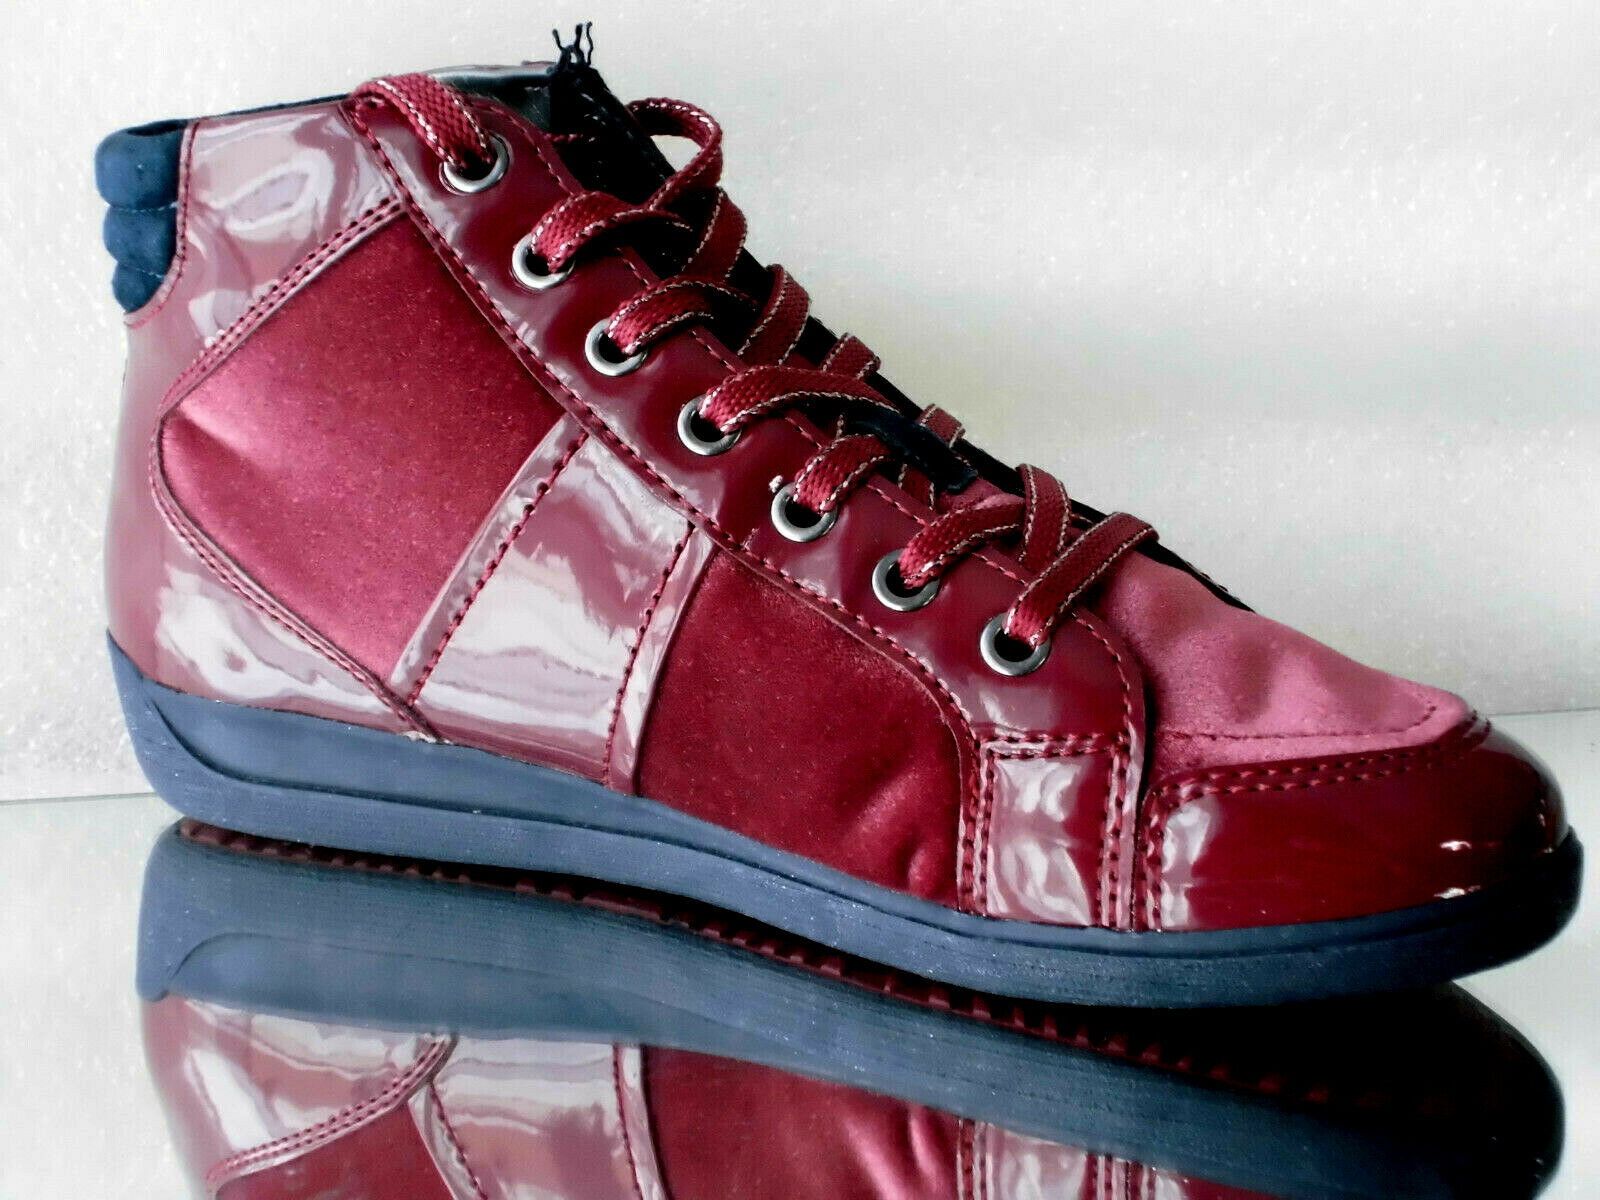 D Bordeaux Damengeox Respira Hightop Eur40 Myria 267mm Us10 Sneaker Velvet C7005 WEHYeDI29